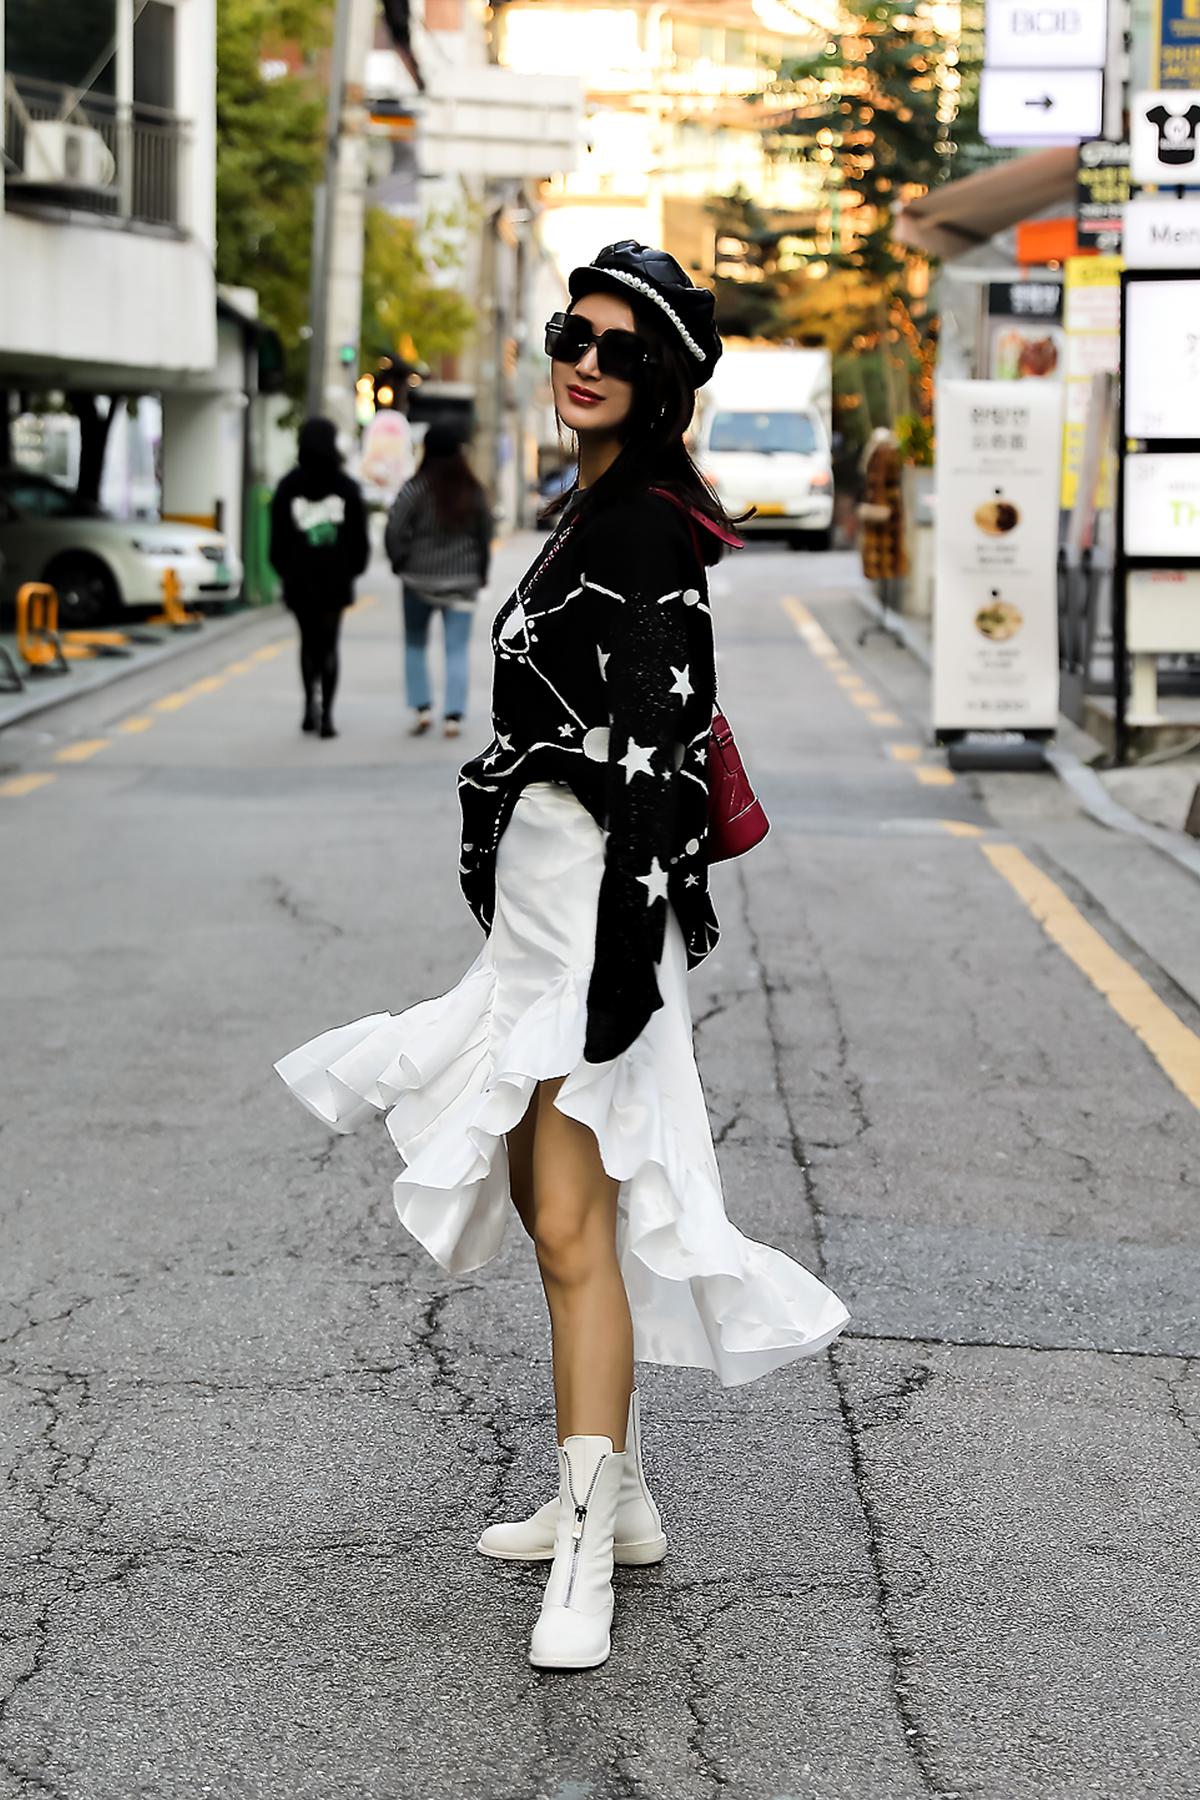 Women fall street style last week of october 2018 inseoul 17